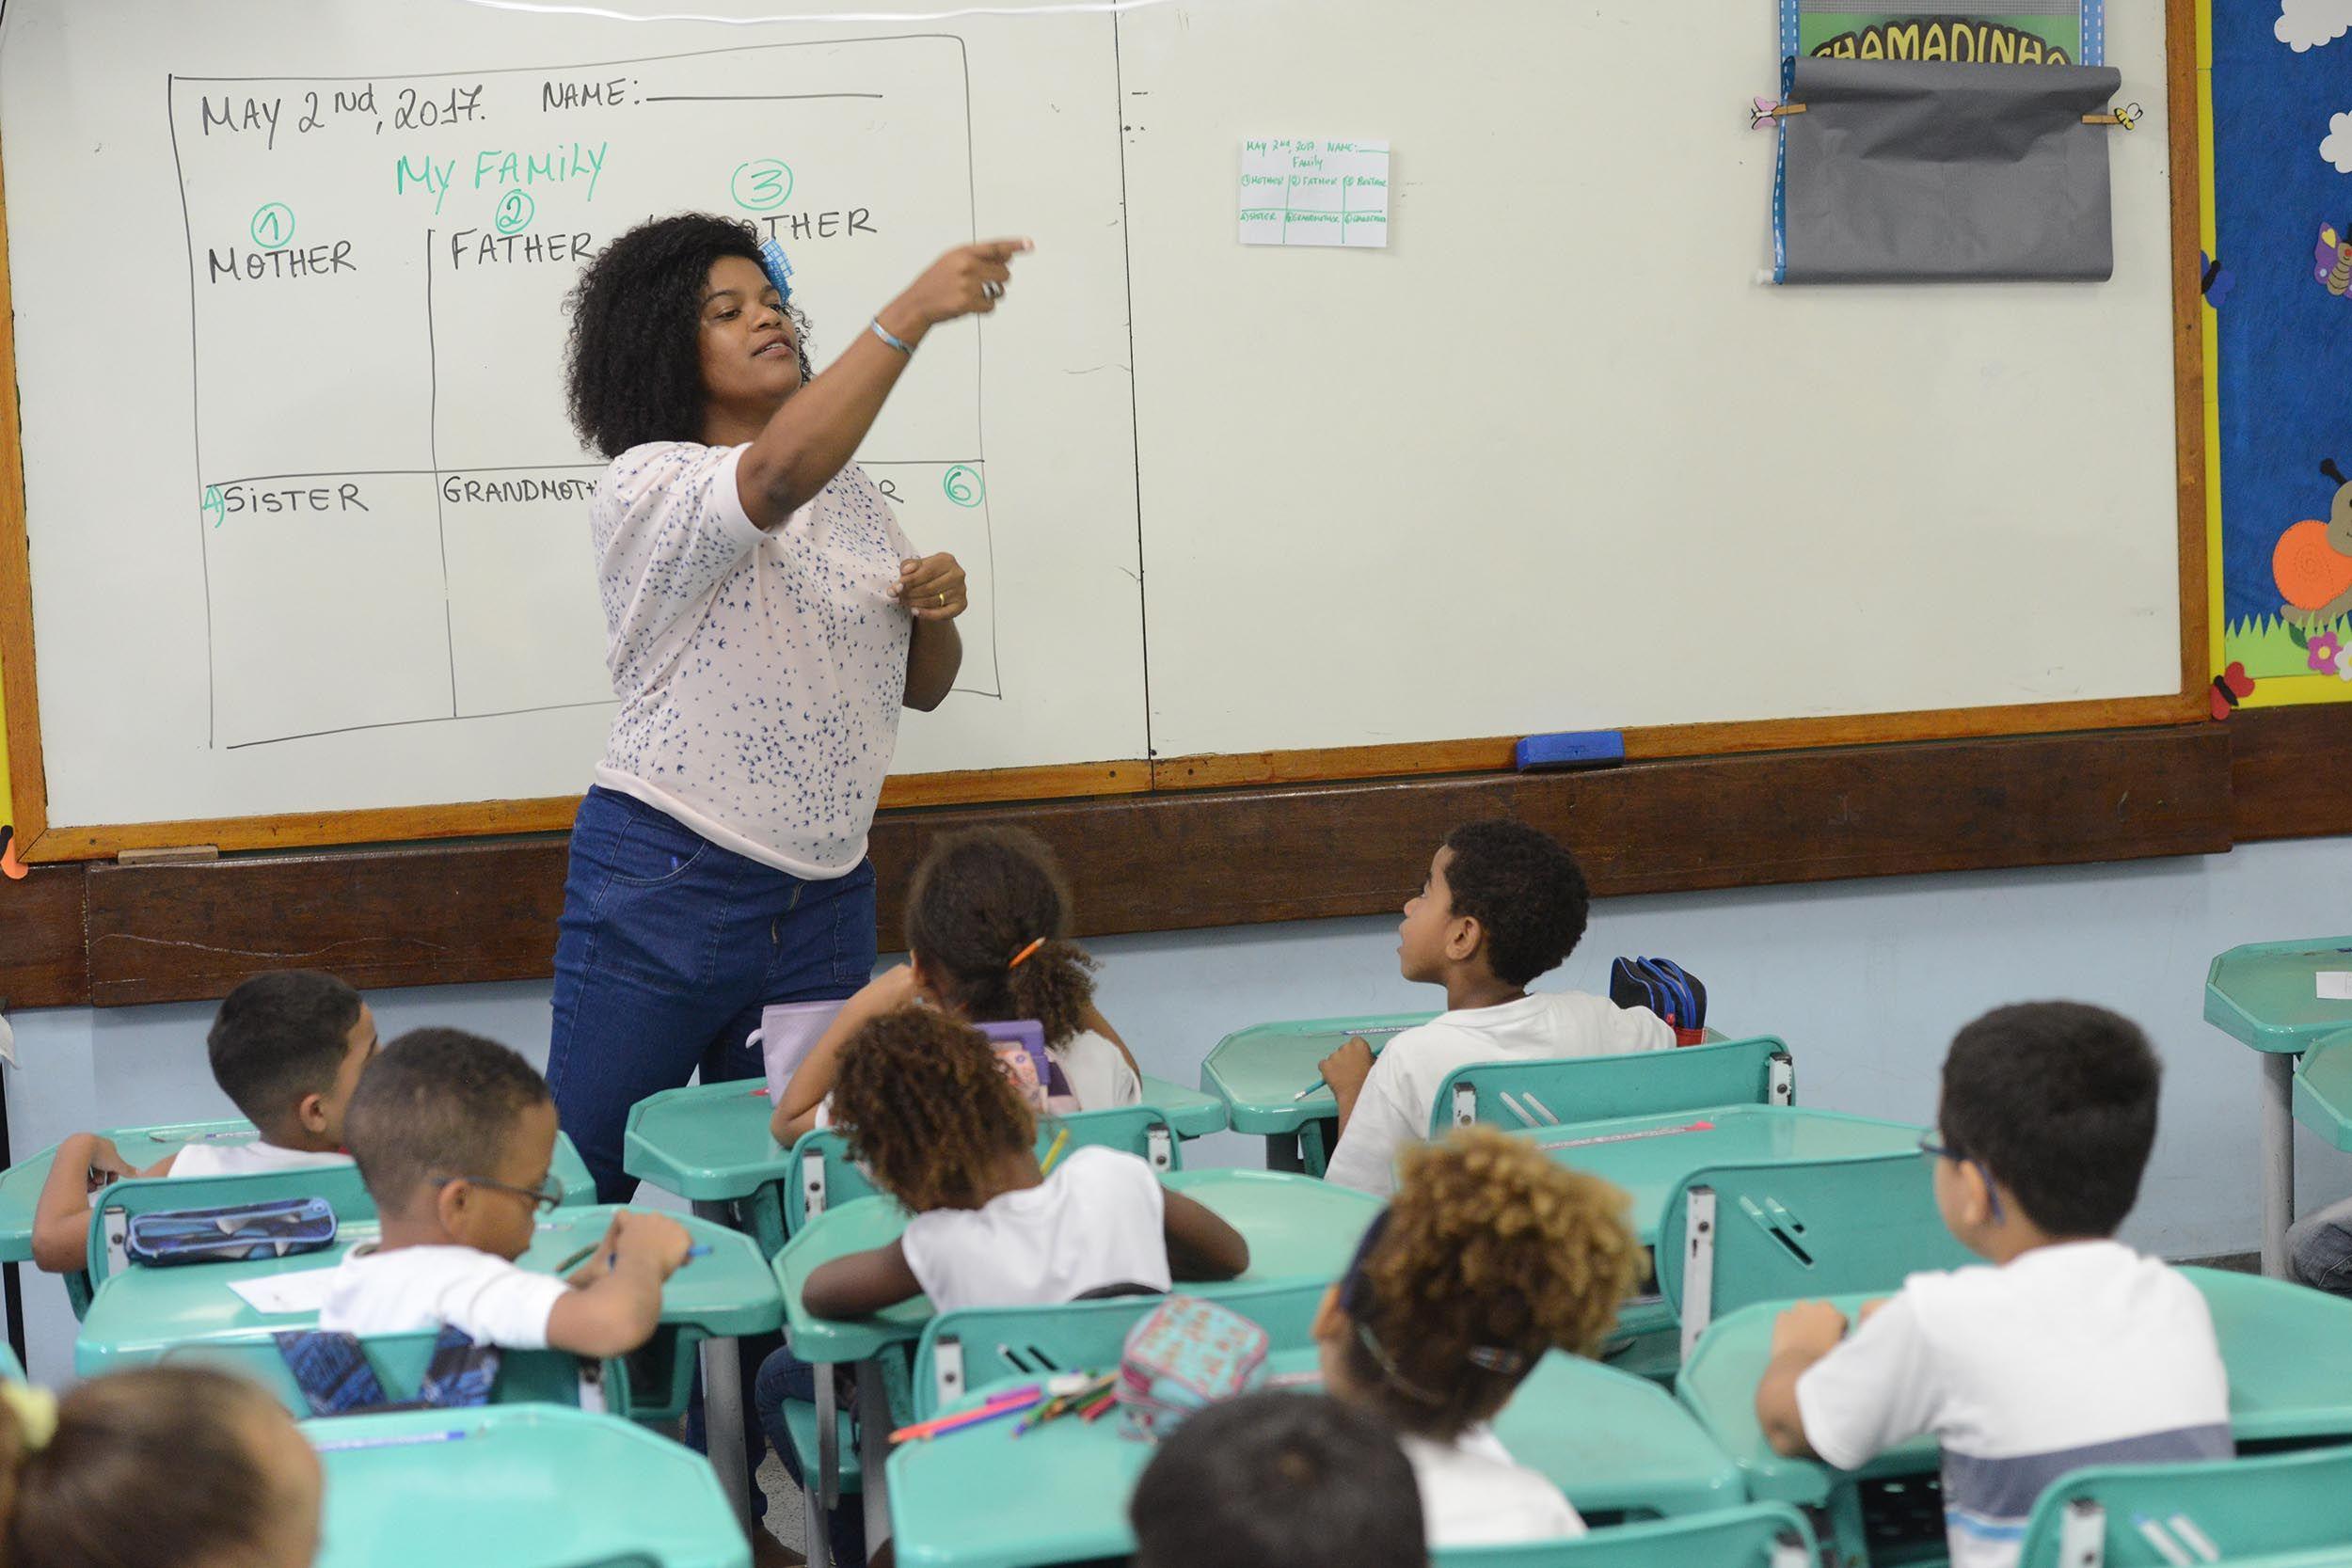 Professora ensinando a pagar um boquete na escola pare de gozar raacutepido e aprenda a controlar sua ereccedilatildeo de forma natural acesse bitlydestruindoaejaculaccedilaoprecocee - 4 7